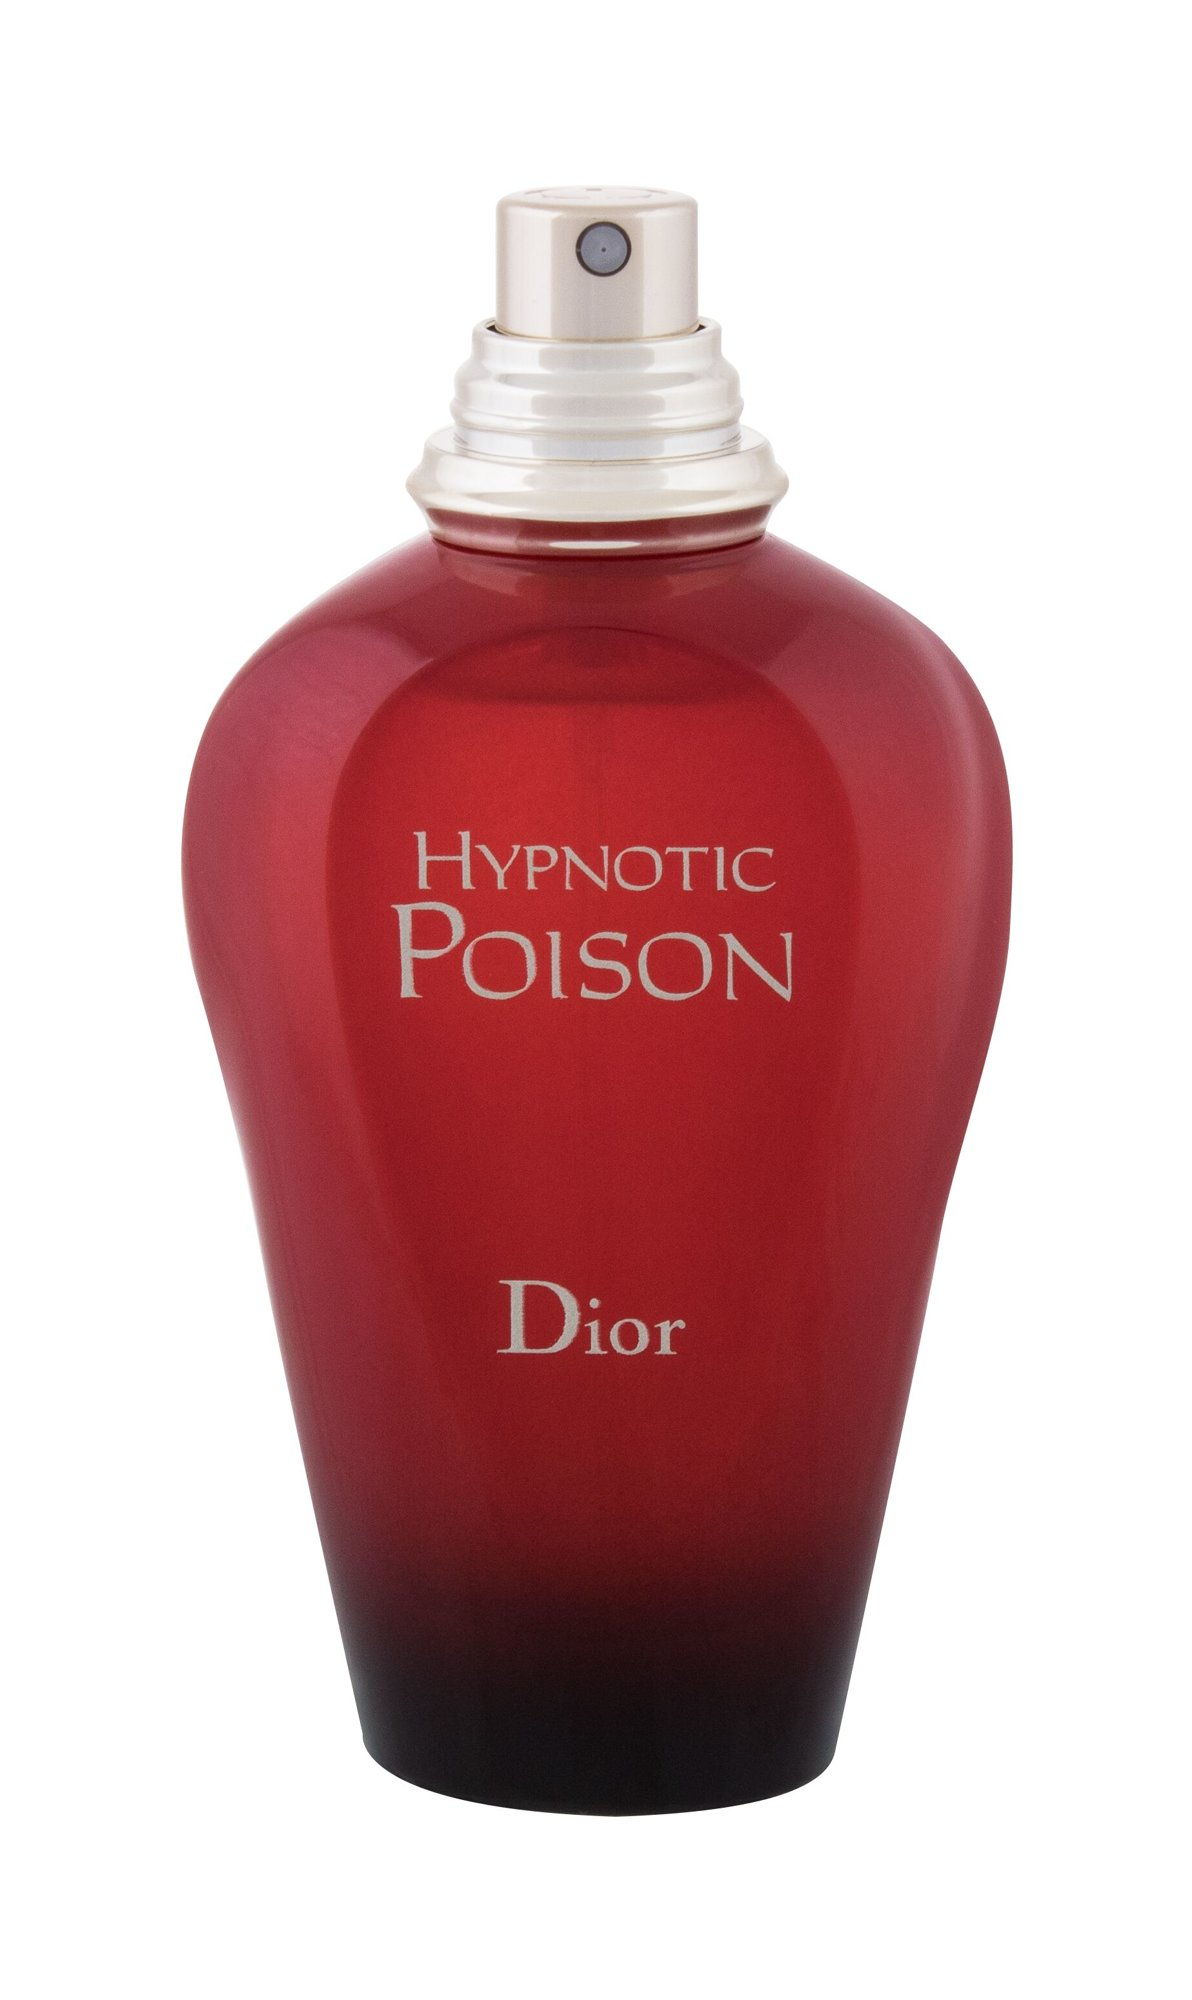 Christian Dior Hypnotic Poison, Vlasová hmla 40ml, Tester